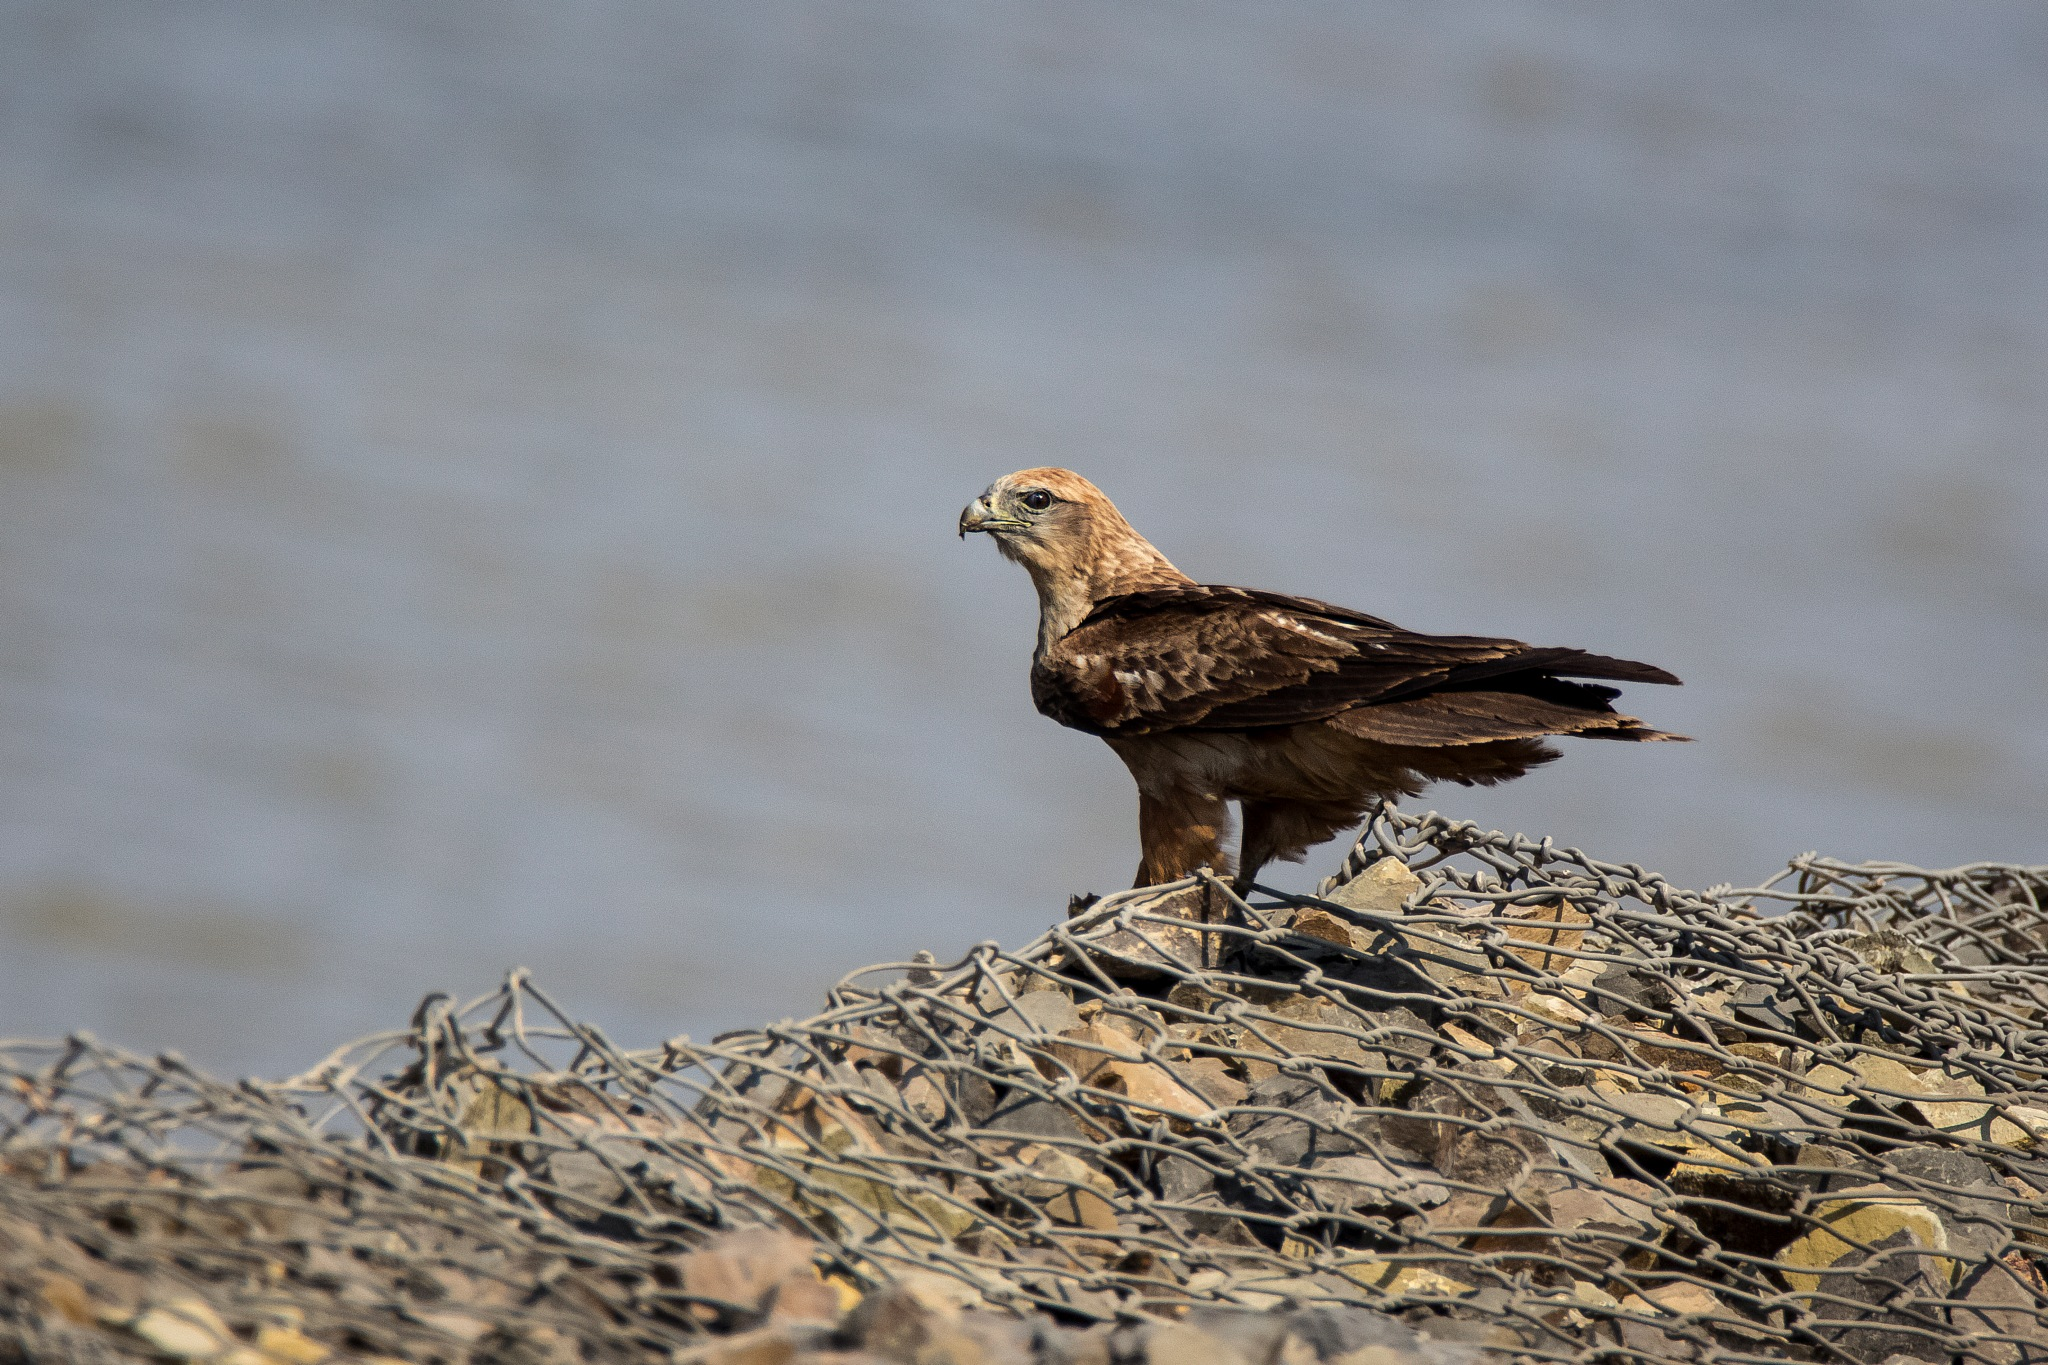 Long Legged Buzzard by Ramnish Geer